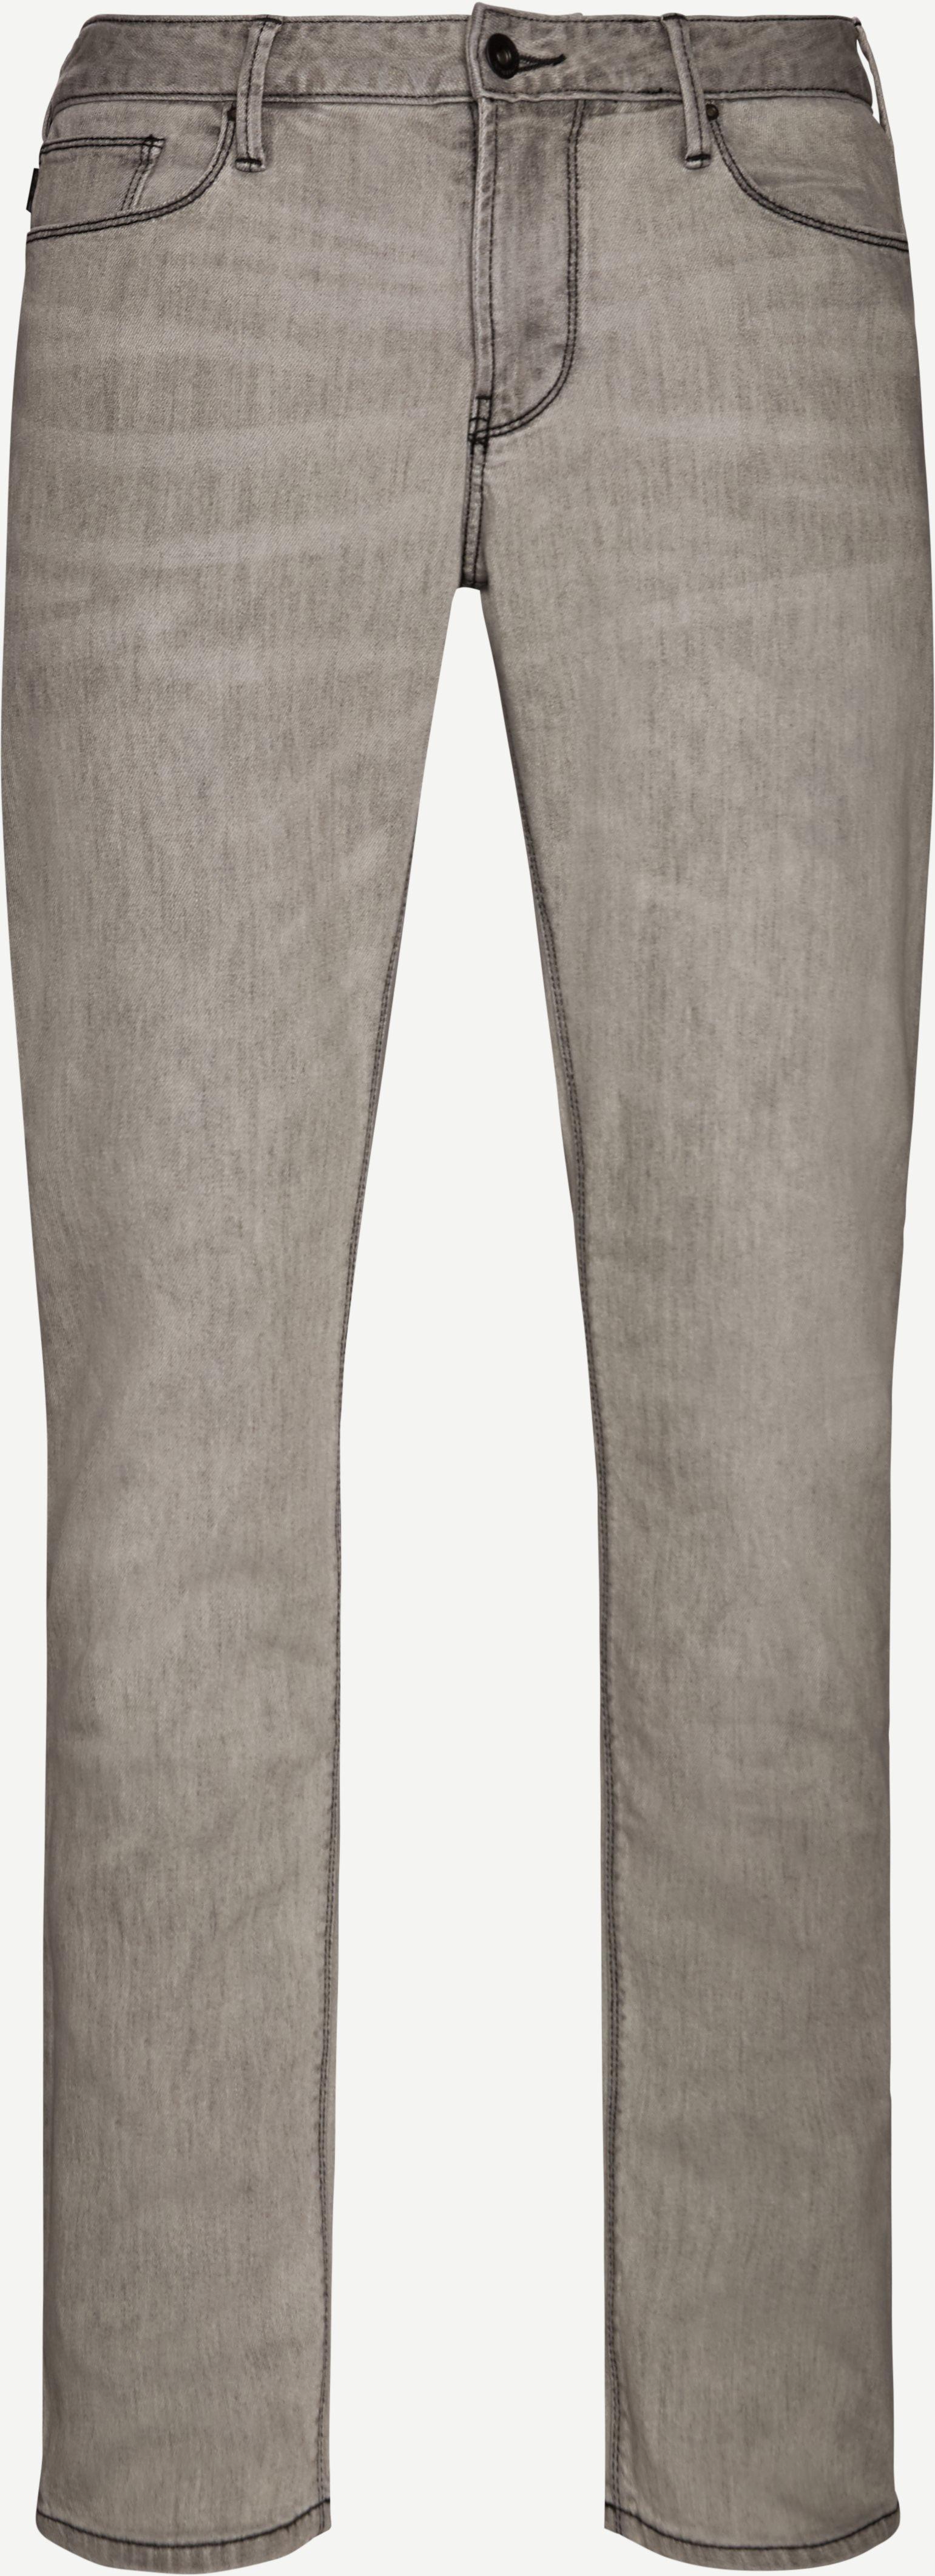 Jeans - Regular - Grey